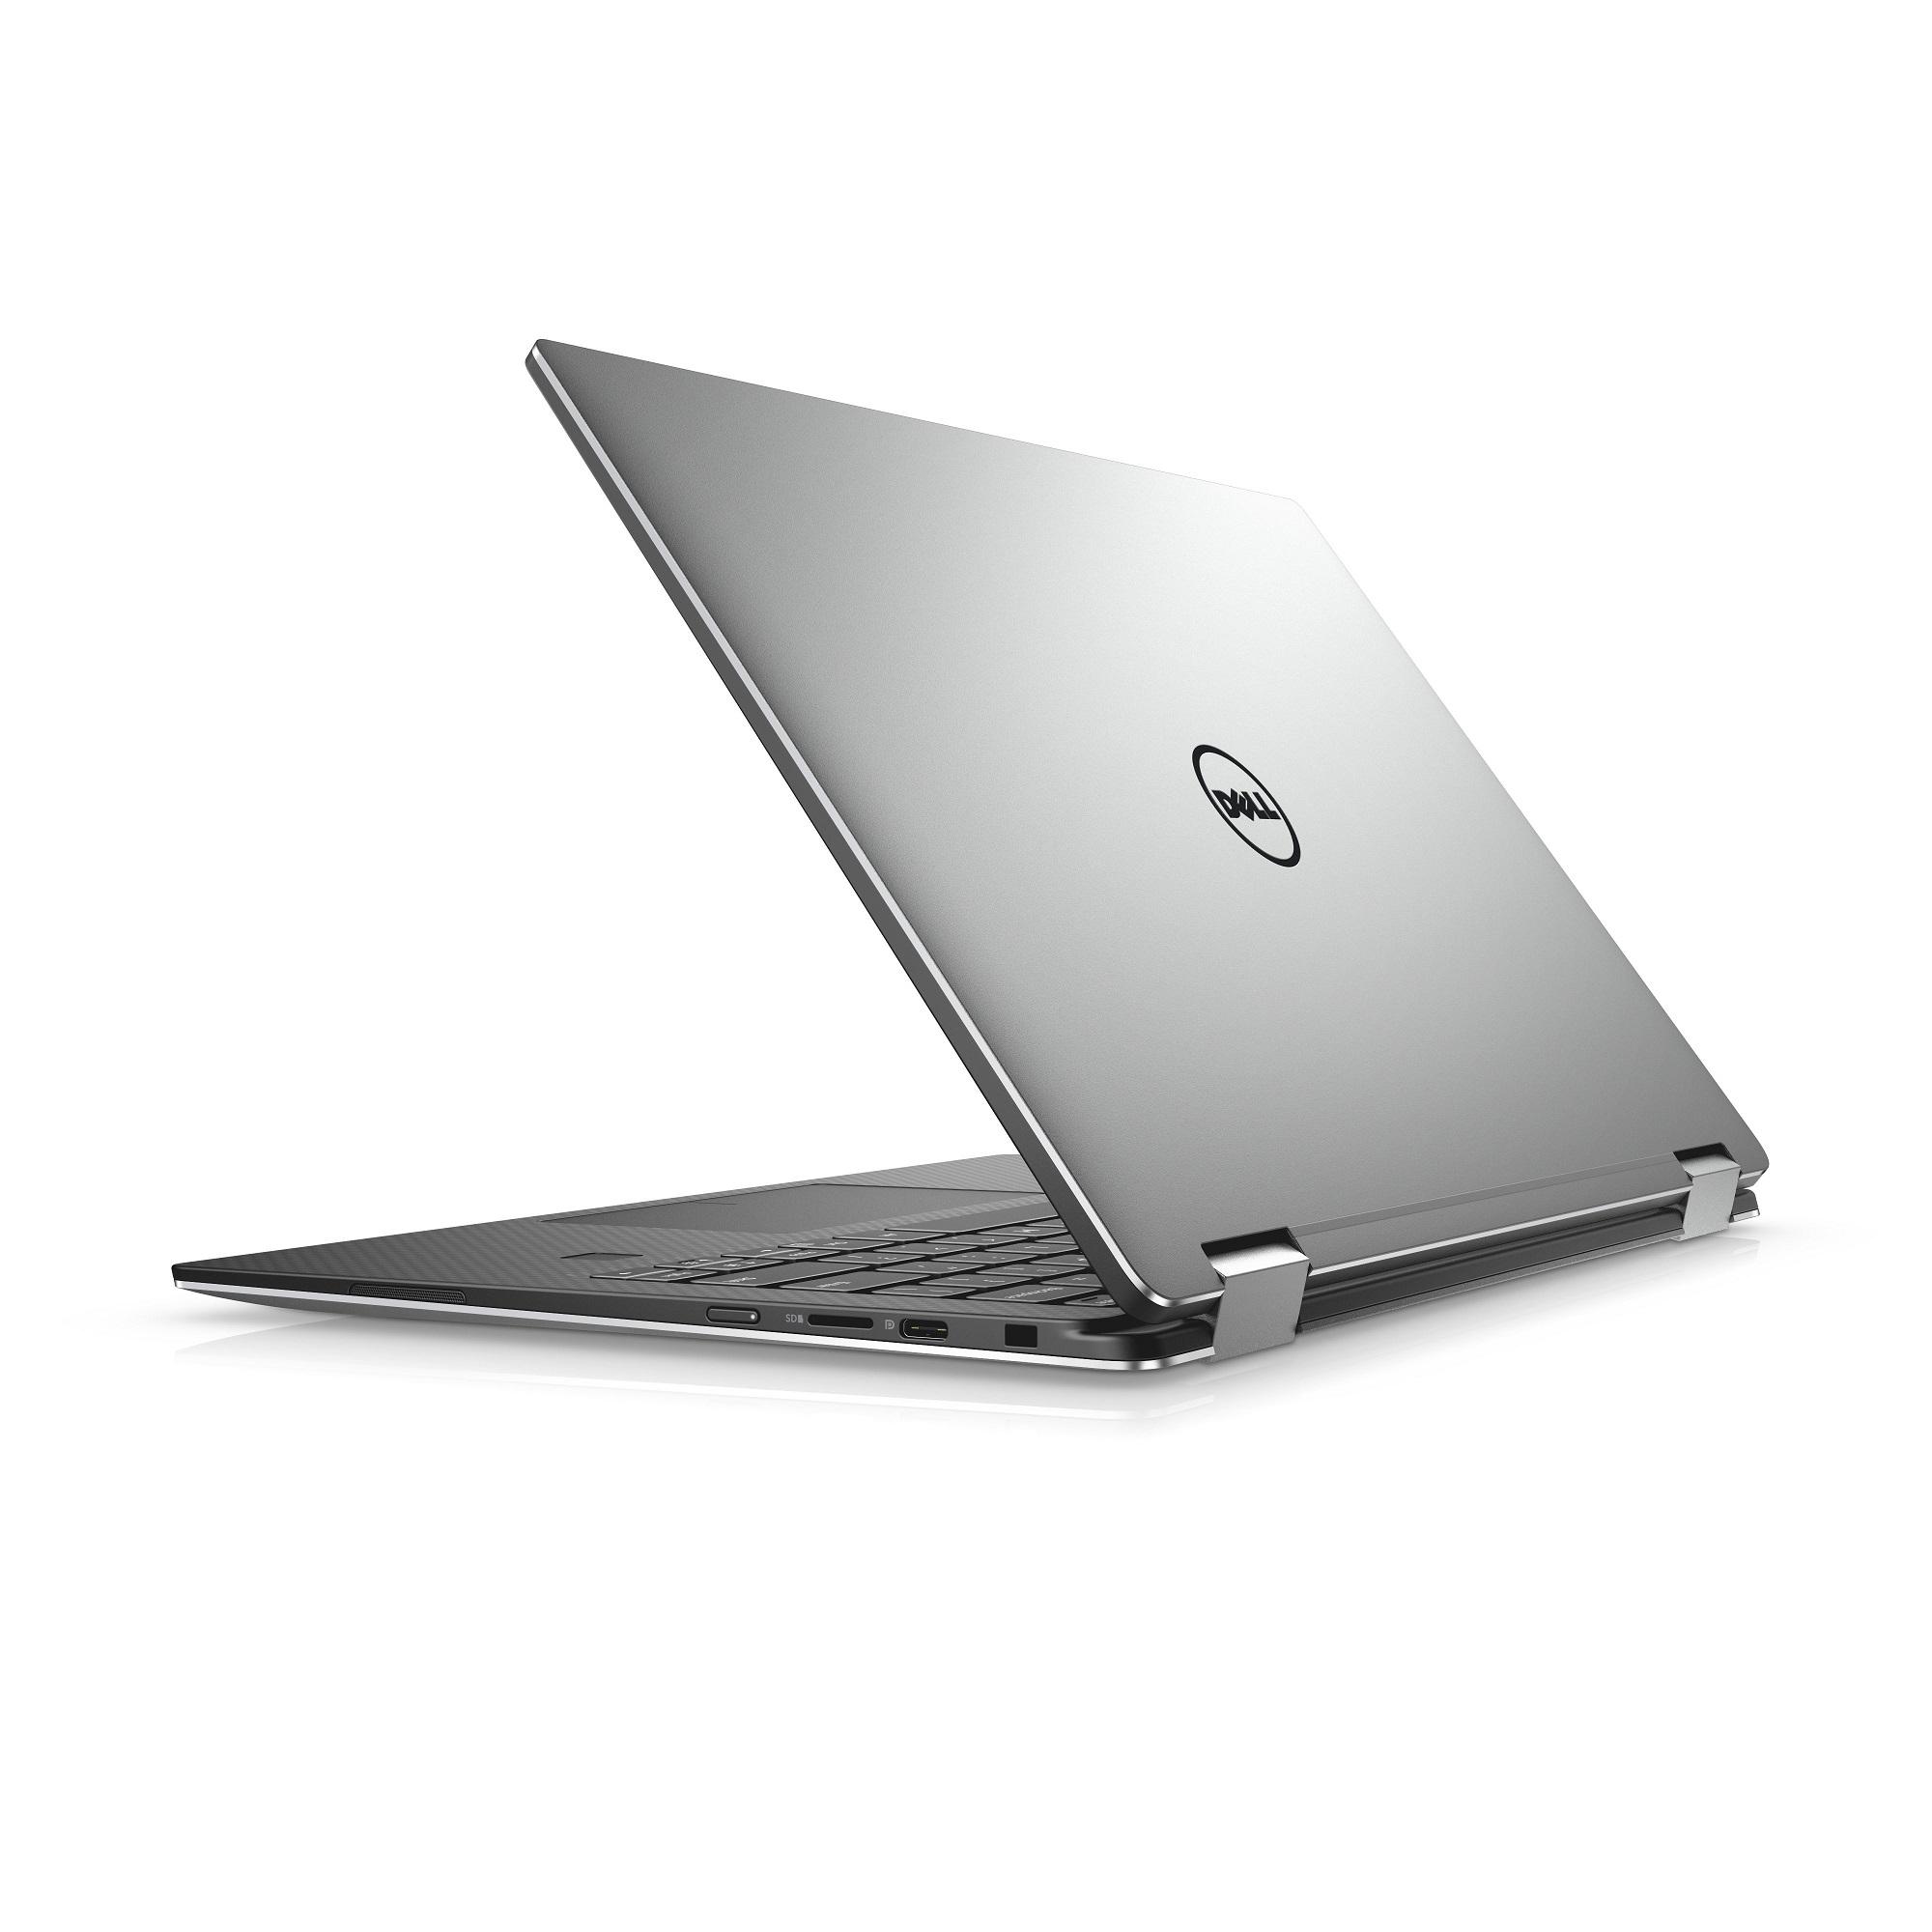 "DELL Ultrabook XPS 13 (9365)/i5-7Y54/8GB/256GB SSD/Intel HD 615/13.3"" QHD+ Touch/Win 10 MUI/Silver"